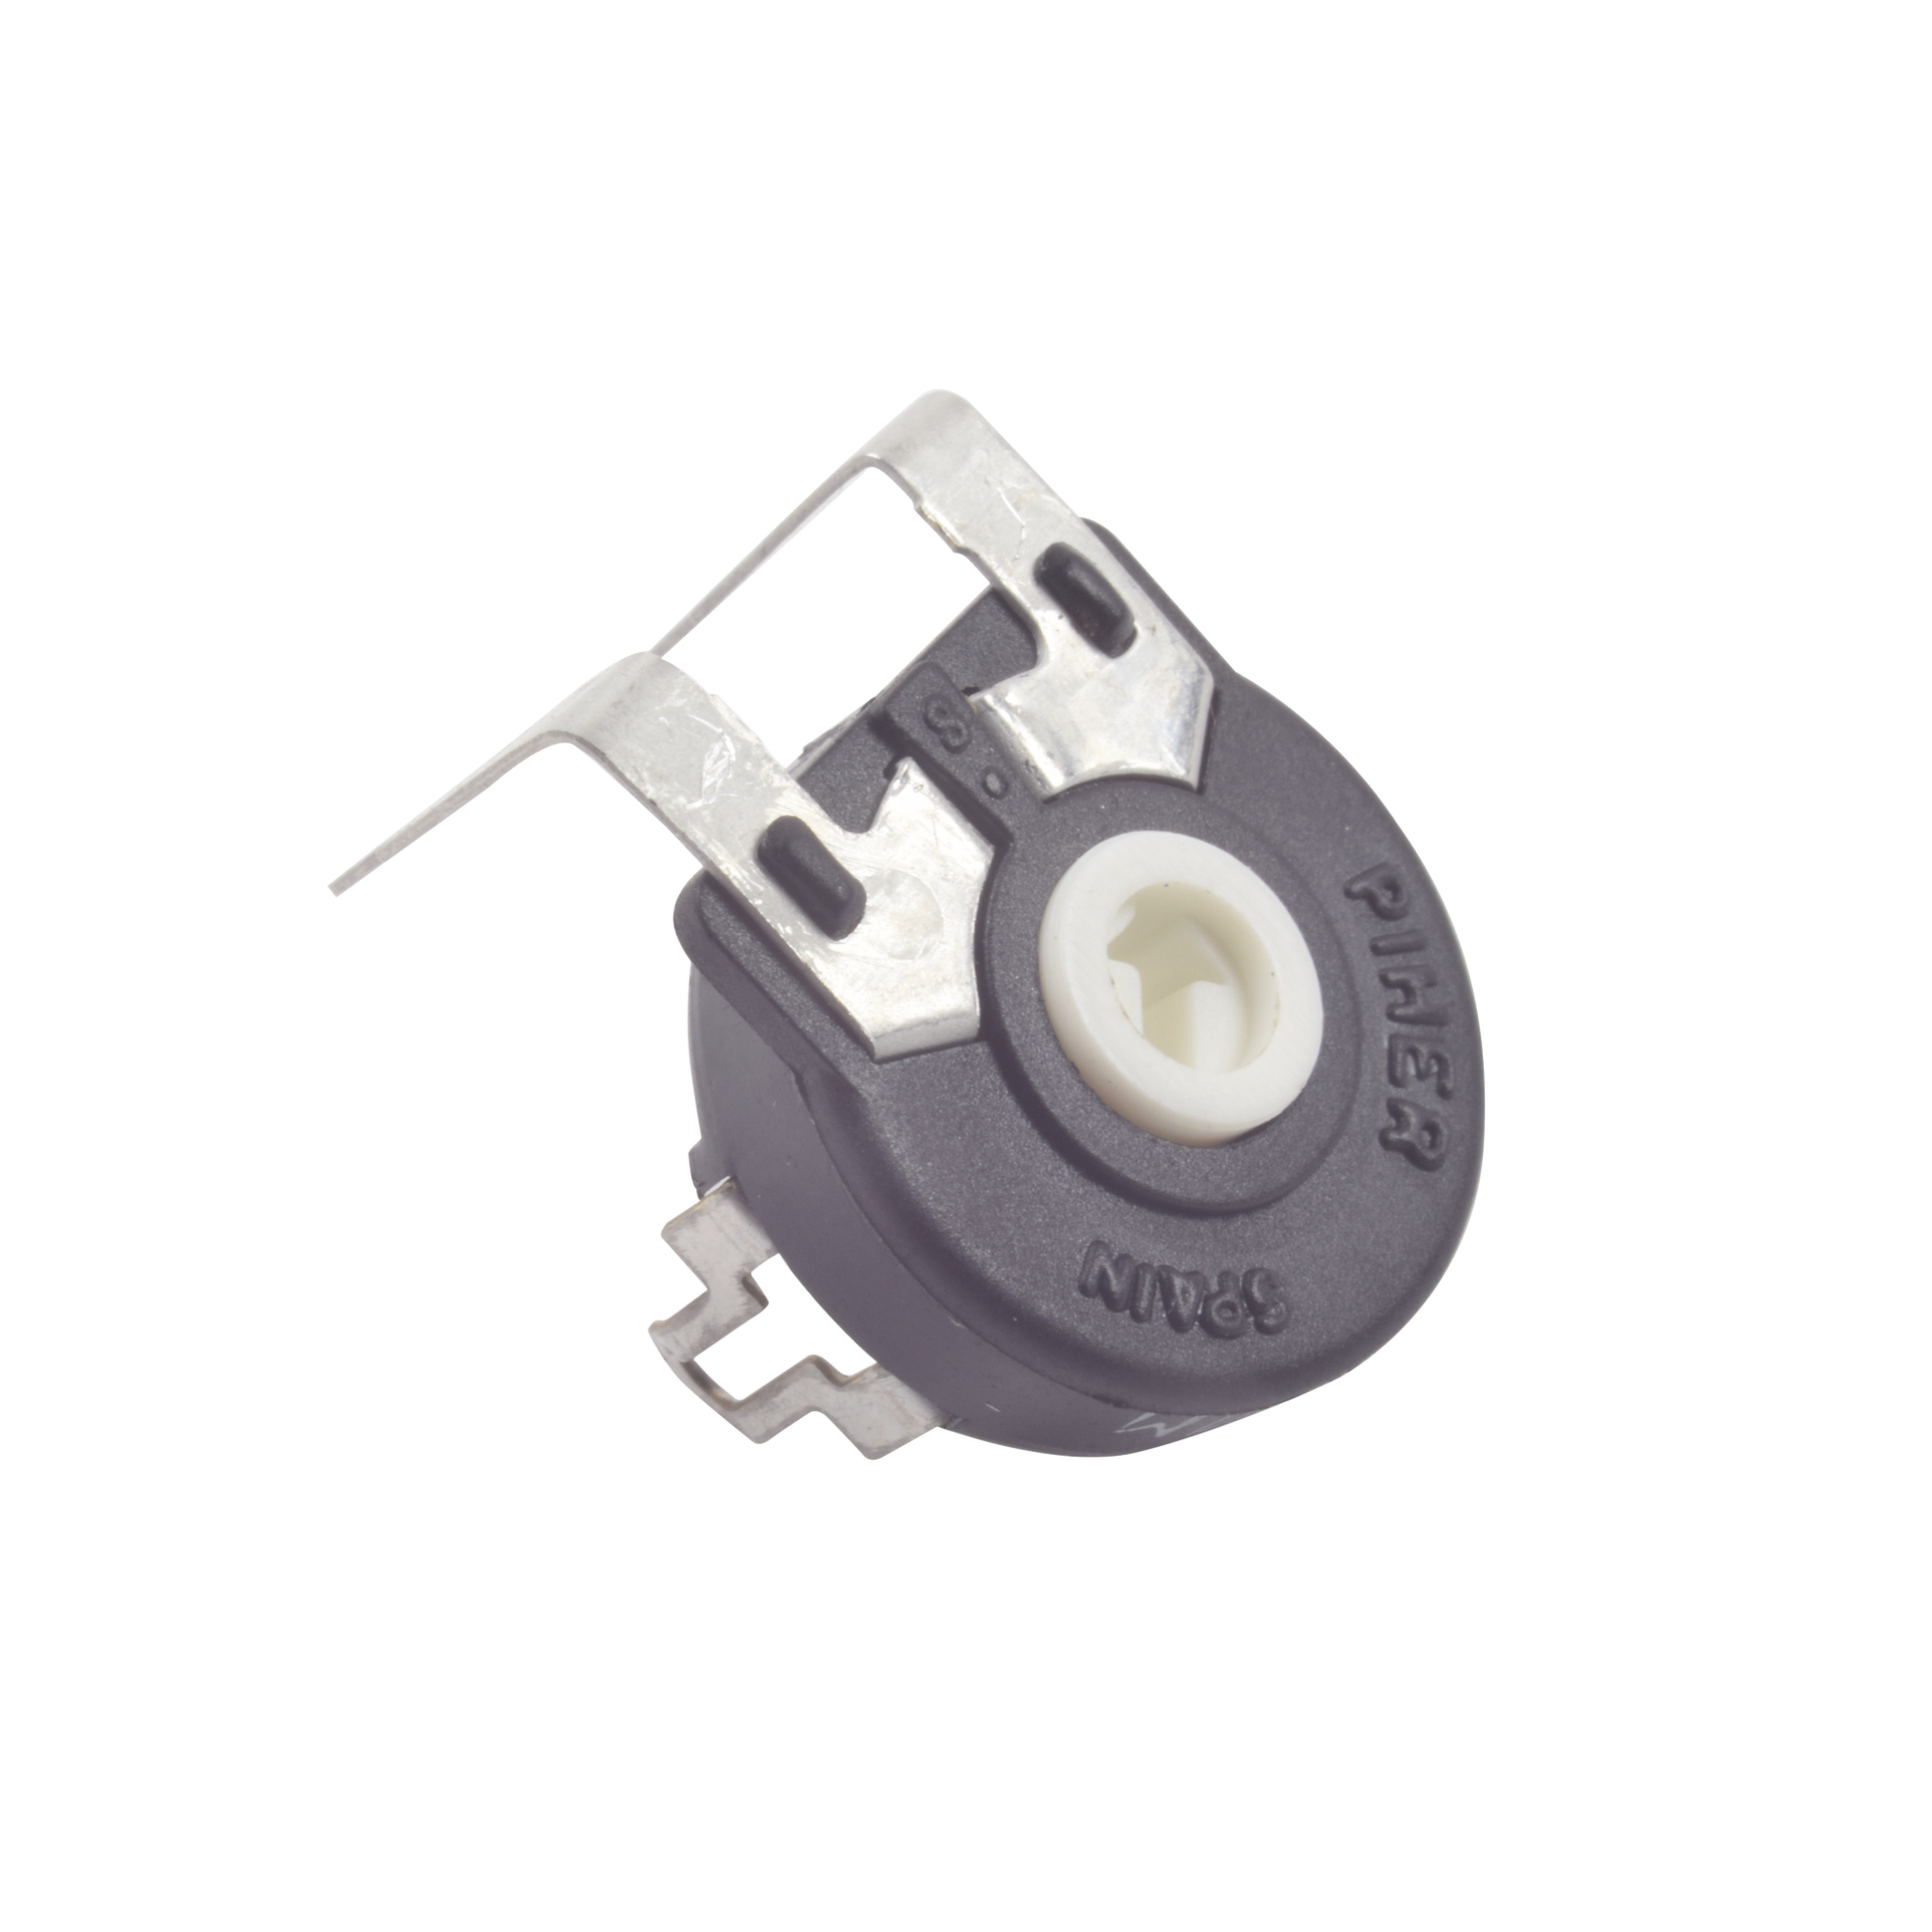 Potenciometro de Carbon de 10 k Ohm, 0.25 Watt 15 mm Ajuste Vertical.